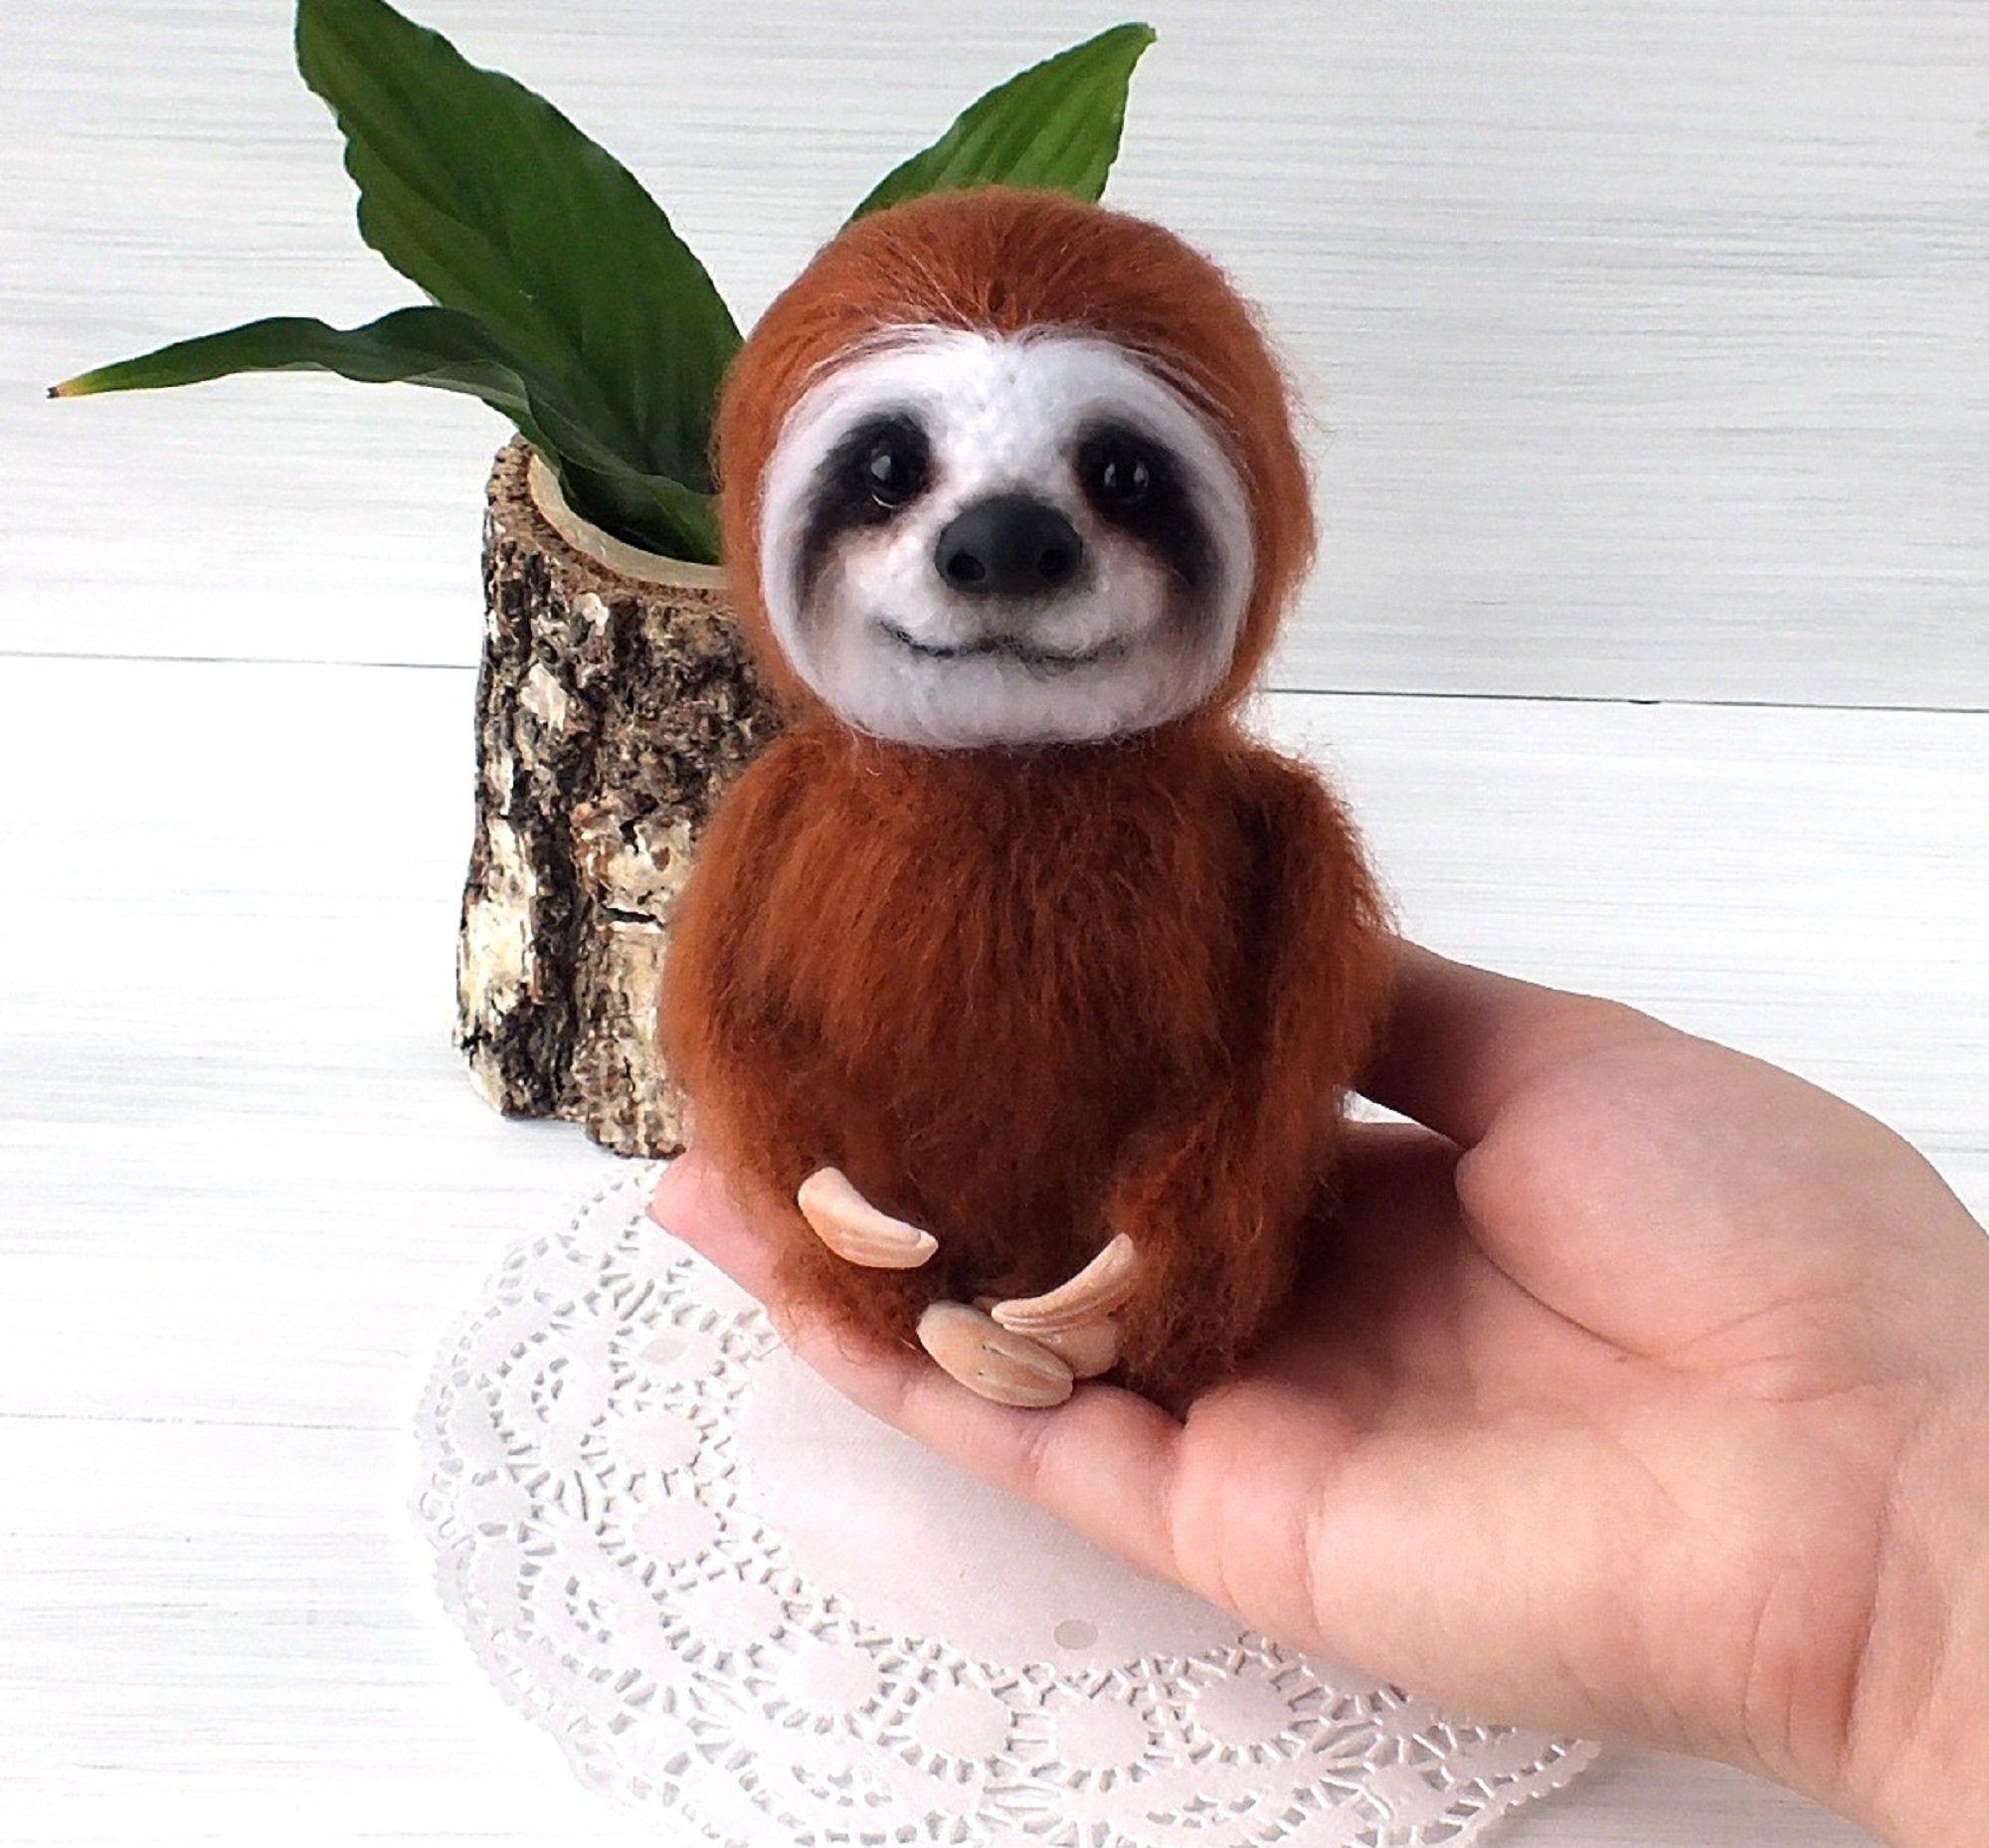 Crochet Amigurumi Sloth Cute Plush Sloth Stuffed Animal Fluffy Sloth Toy Home Decoration Gift For Girl Toy For S In 2020 Sloth Stuffed Animal Cute Plush Crochet Sloth